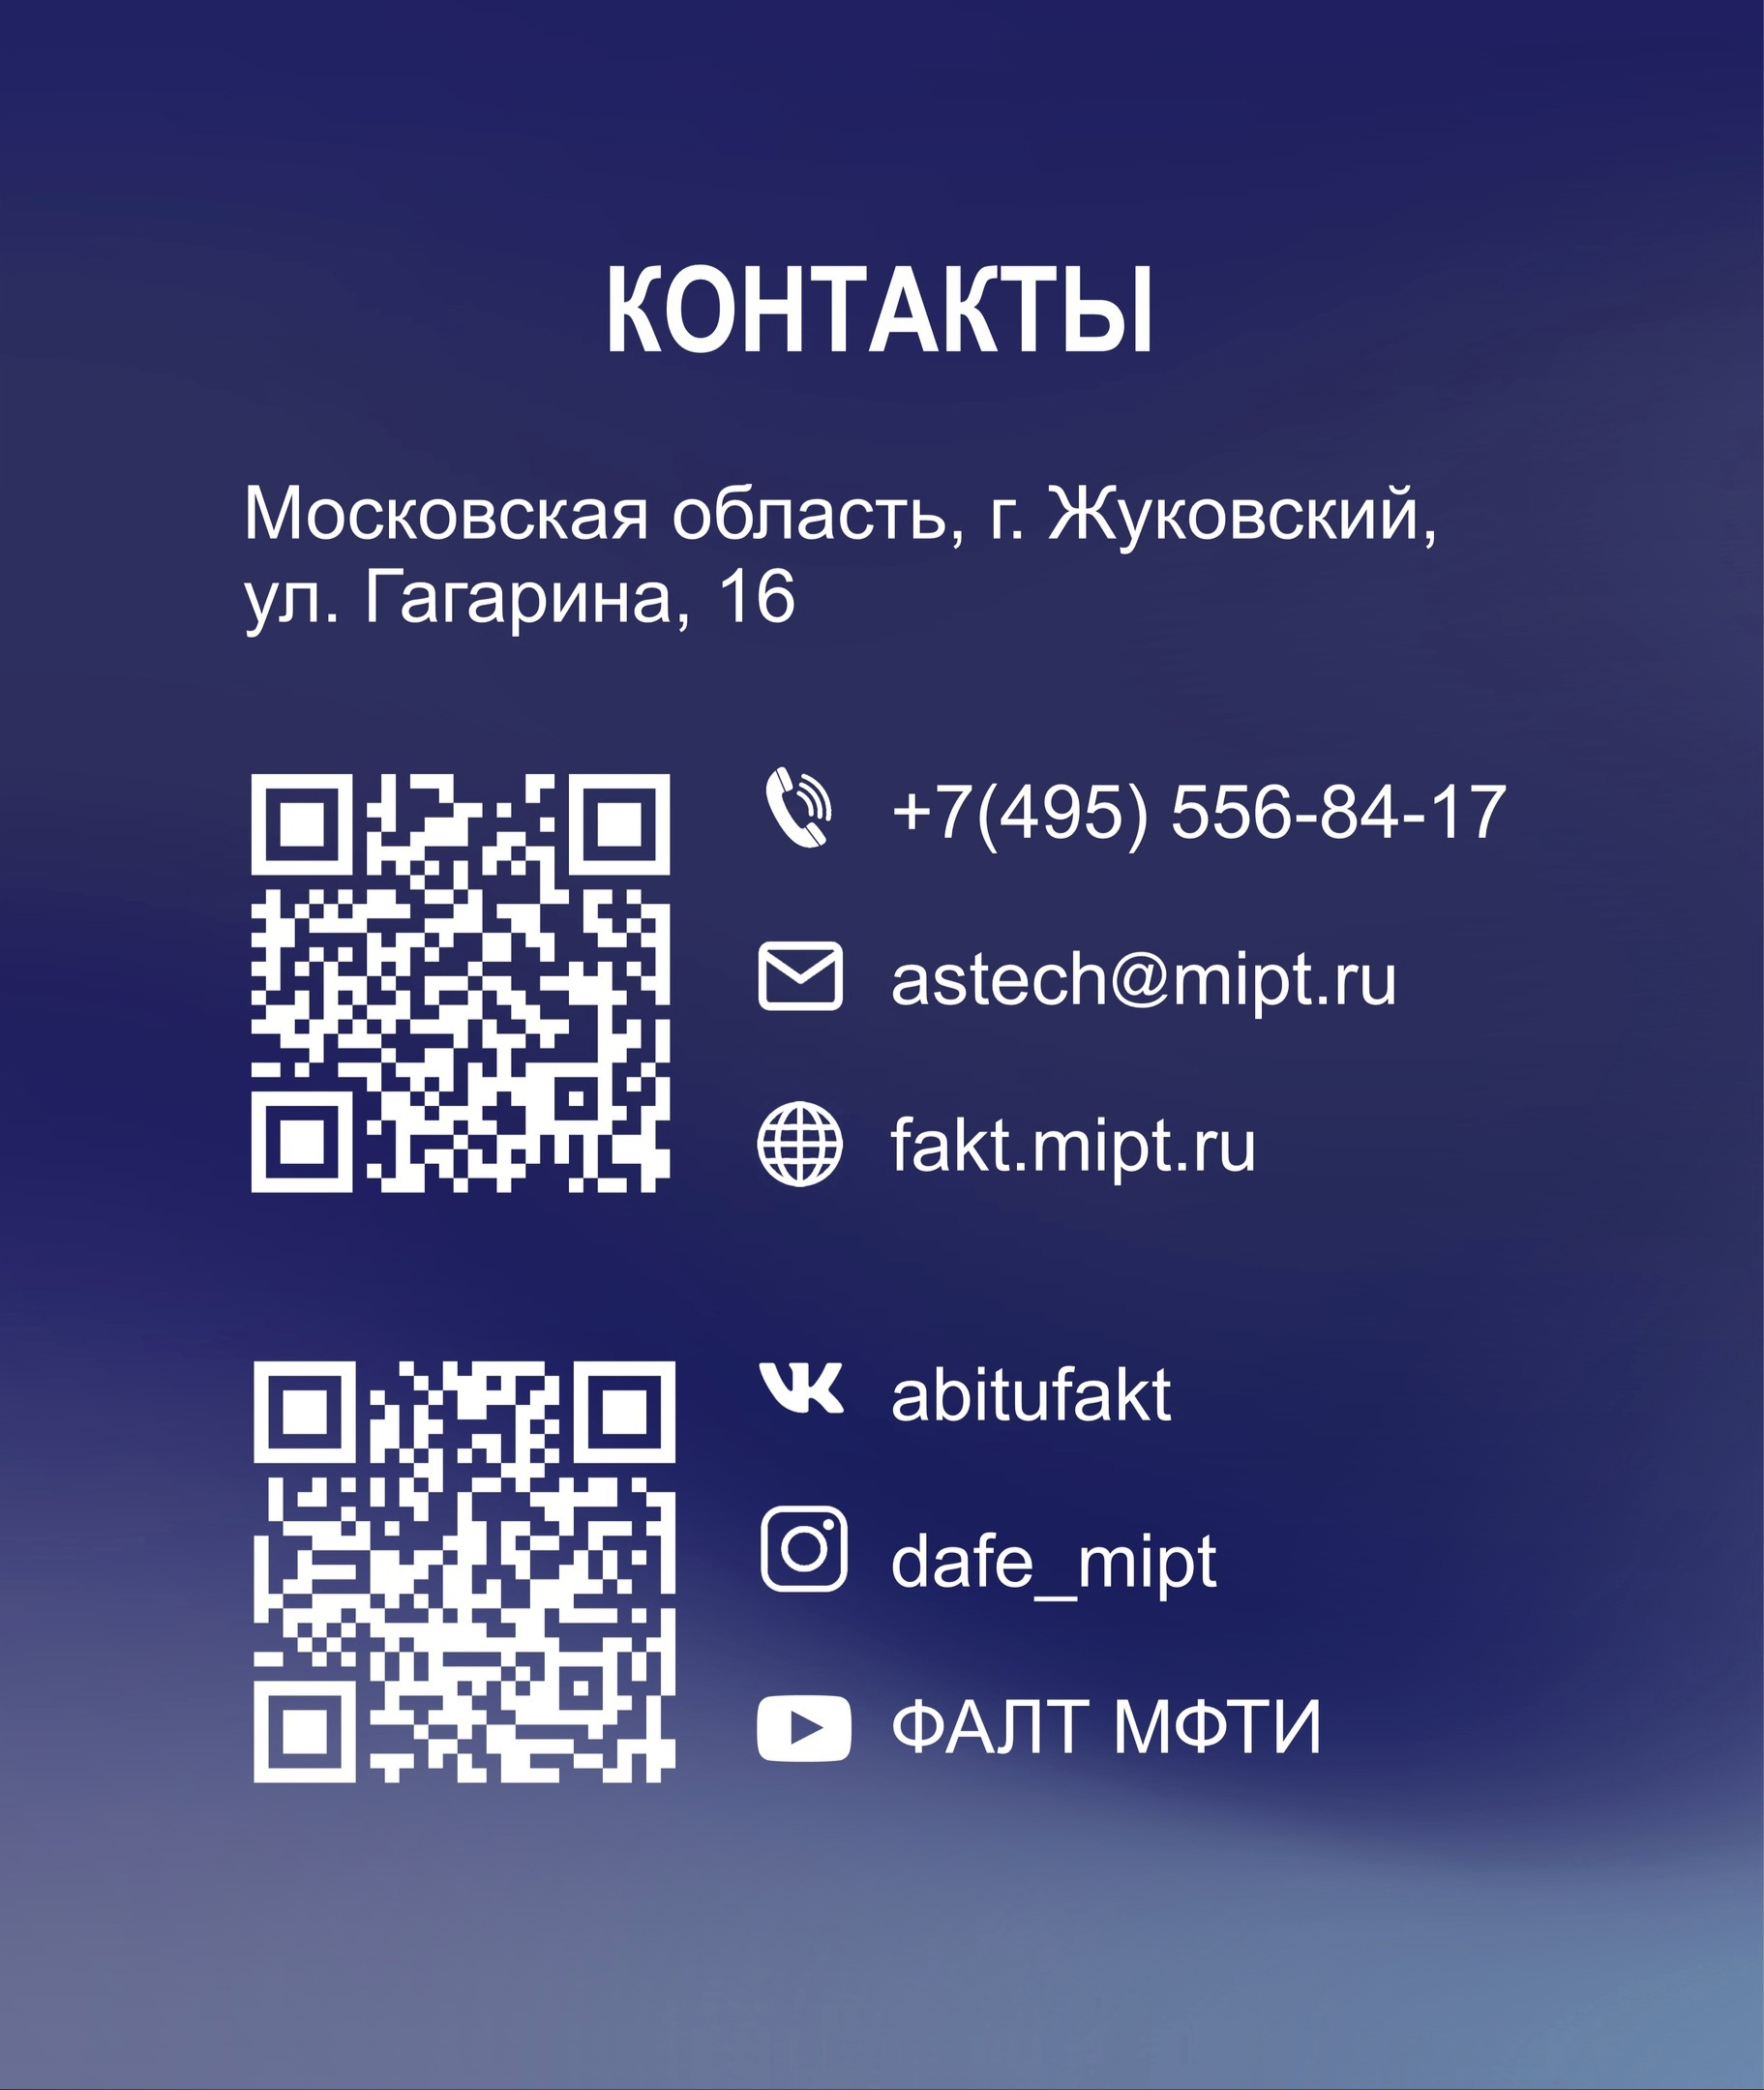 https://sun9-62.userapi.com/impg/bsV5TJYi5d_GUvs7arkGipOZdad1_HALhIWN1g/yyDkIQr2ERA.jpg?size=1823x2160&quality=96&sign=64712bbd5857240949395b66761f279e&type=album